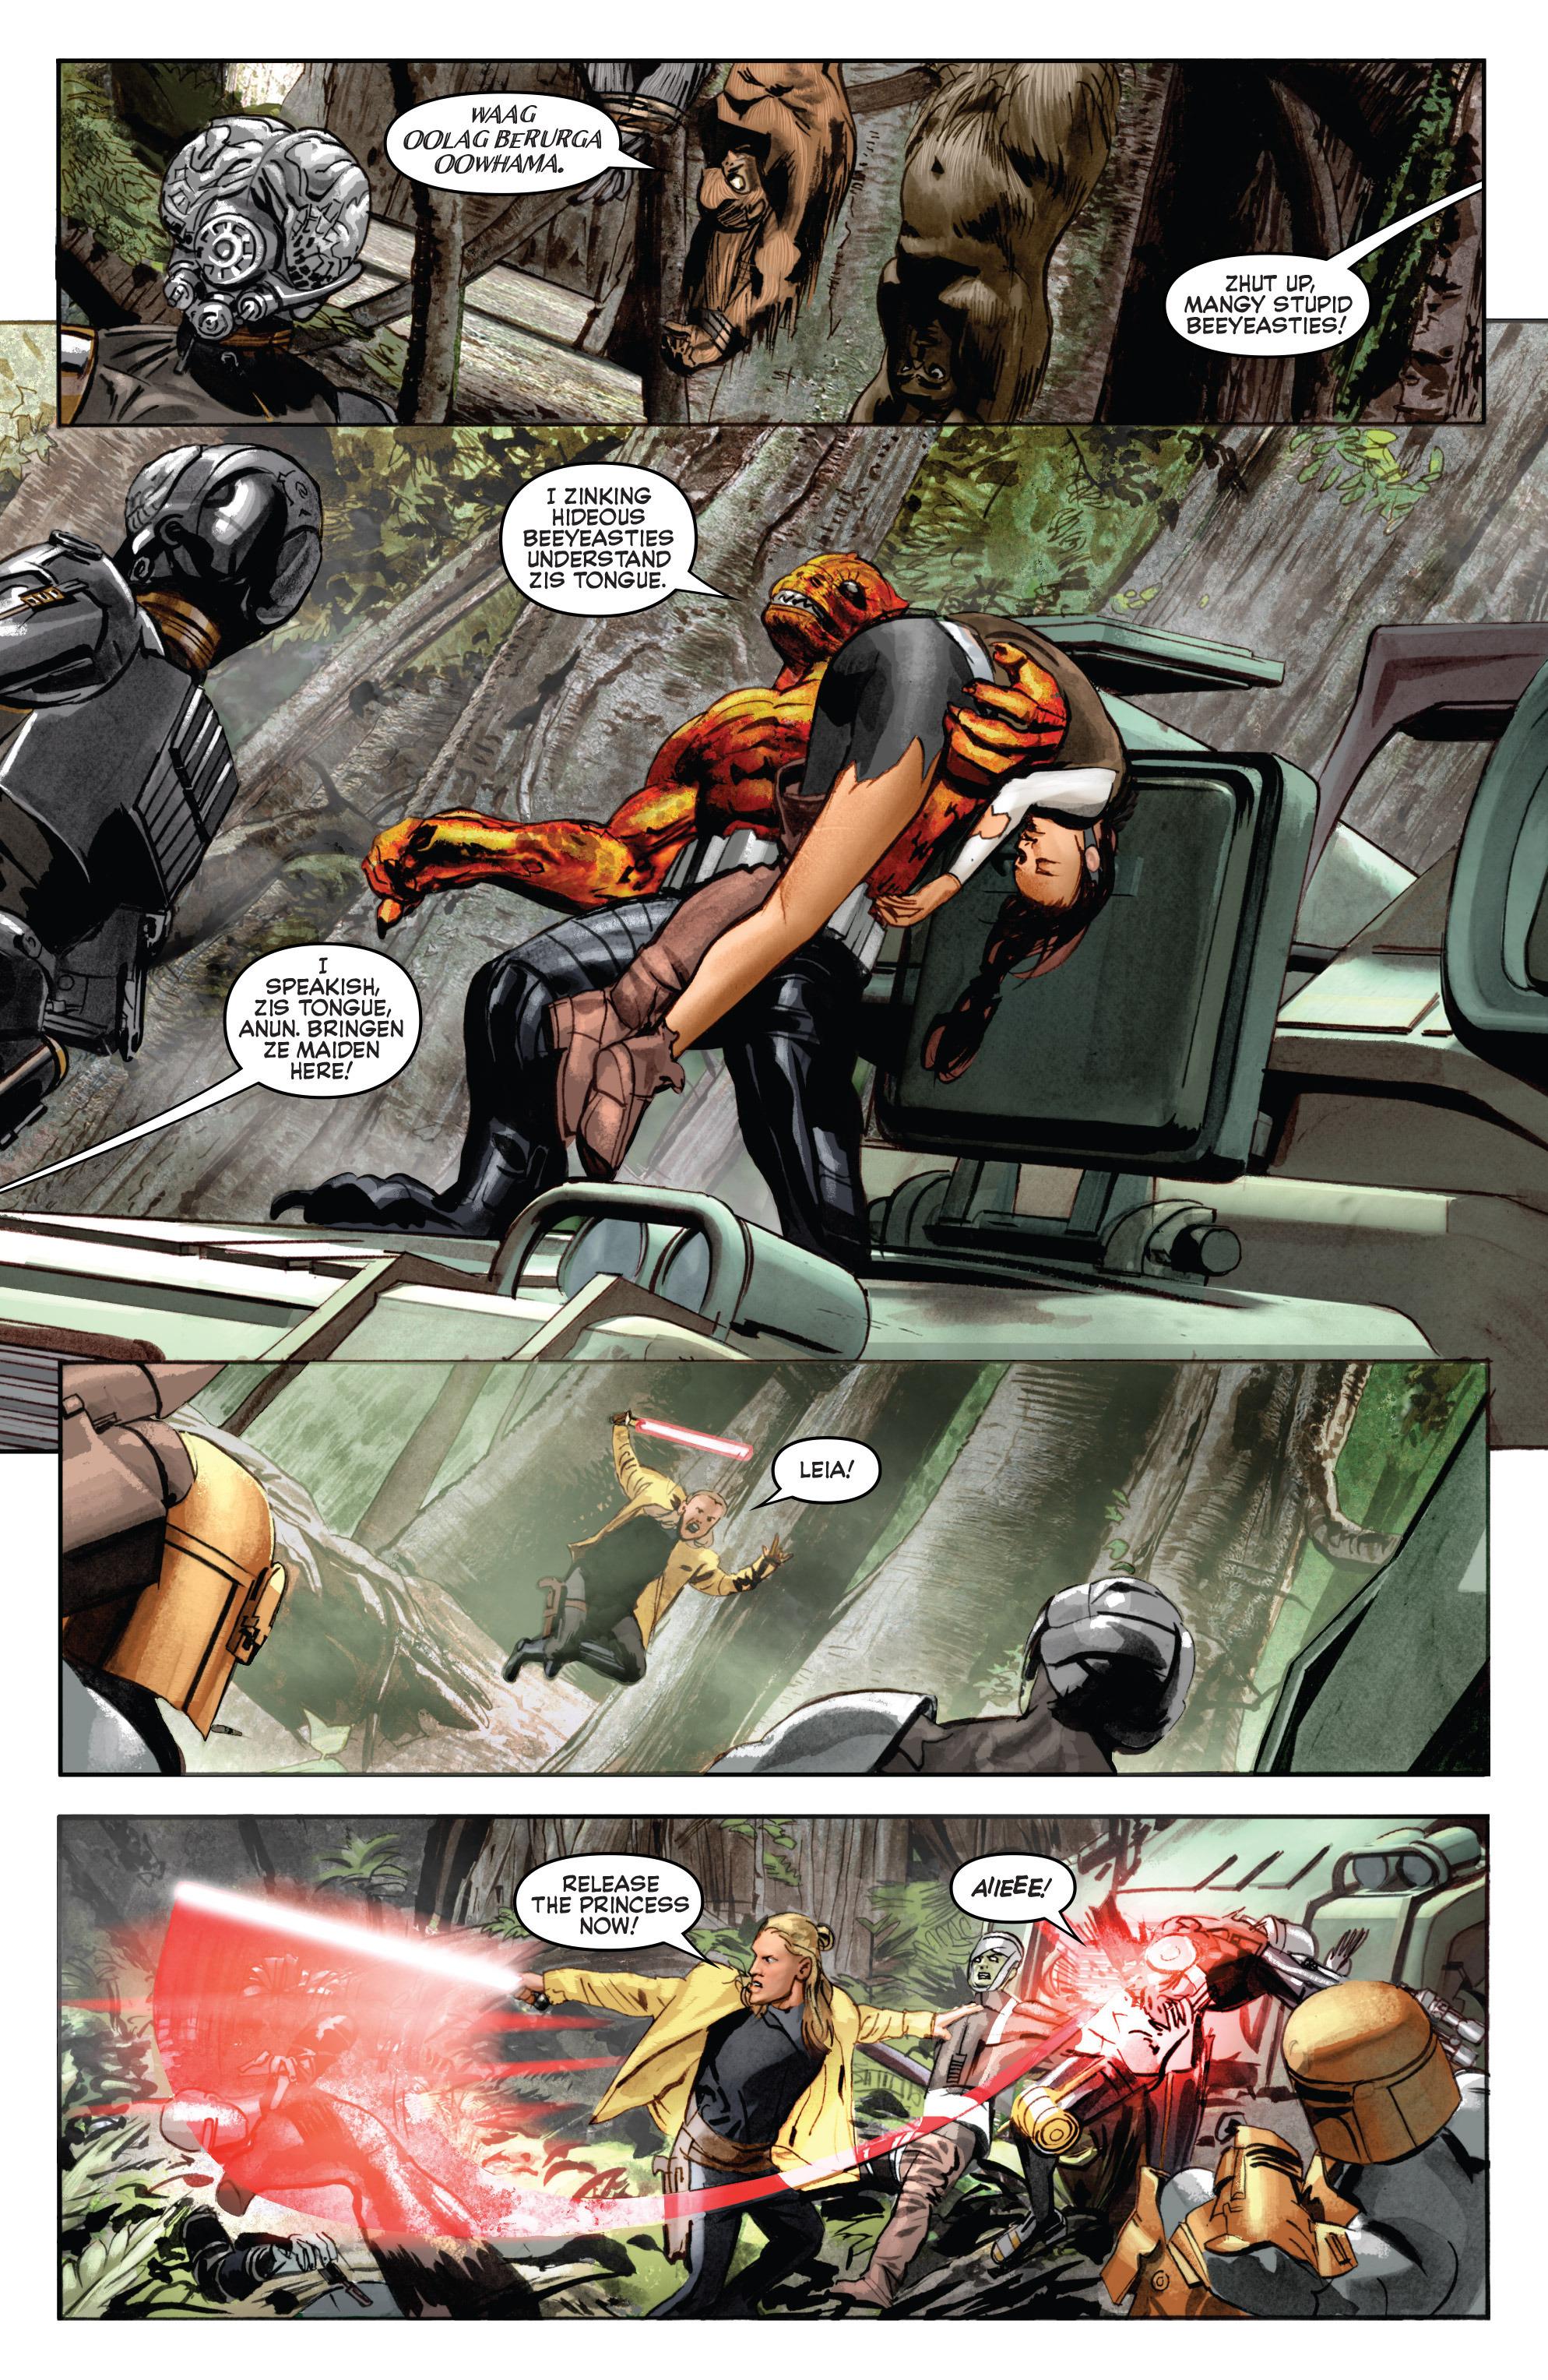 THE STAR WARS comic (2015, Marvel edition) Vol.7 17